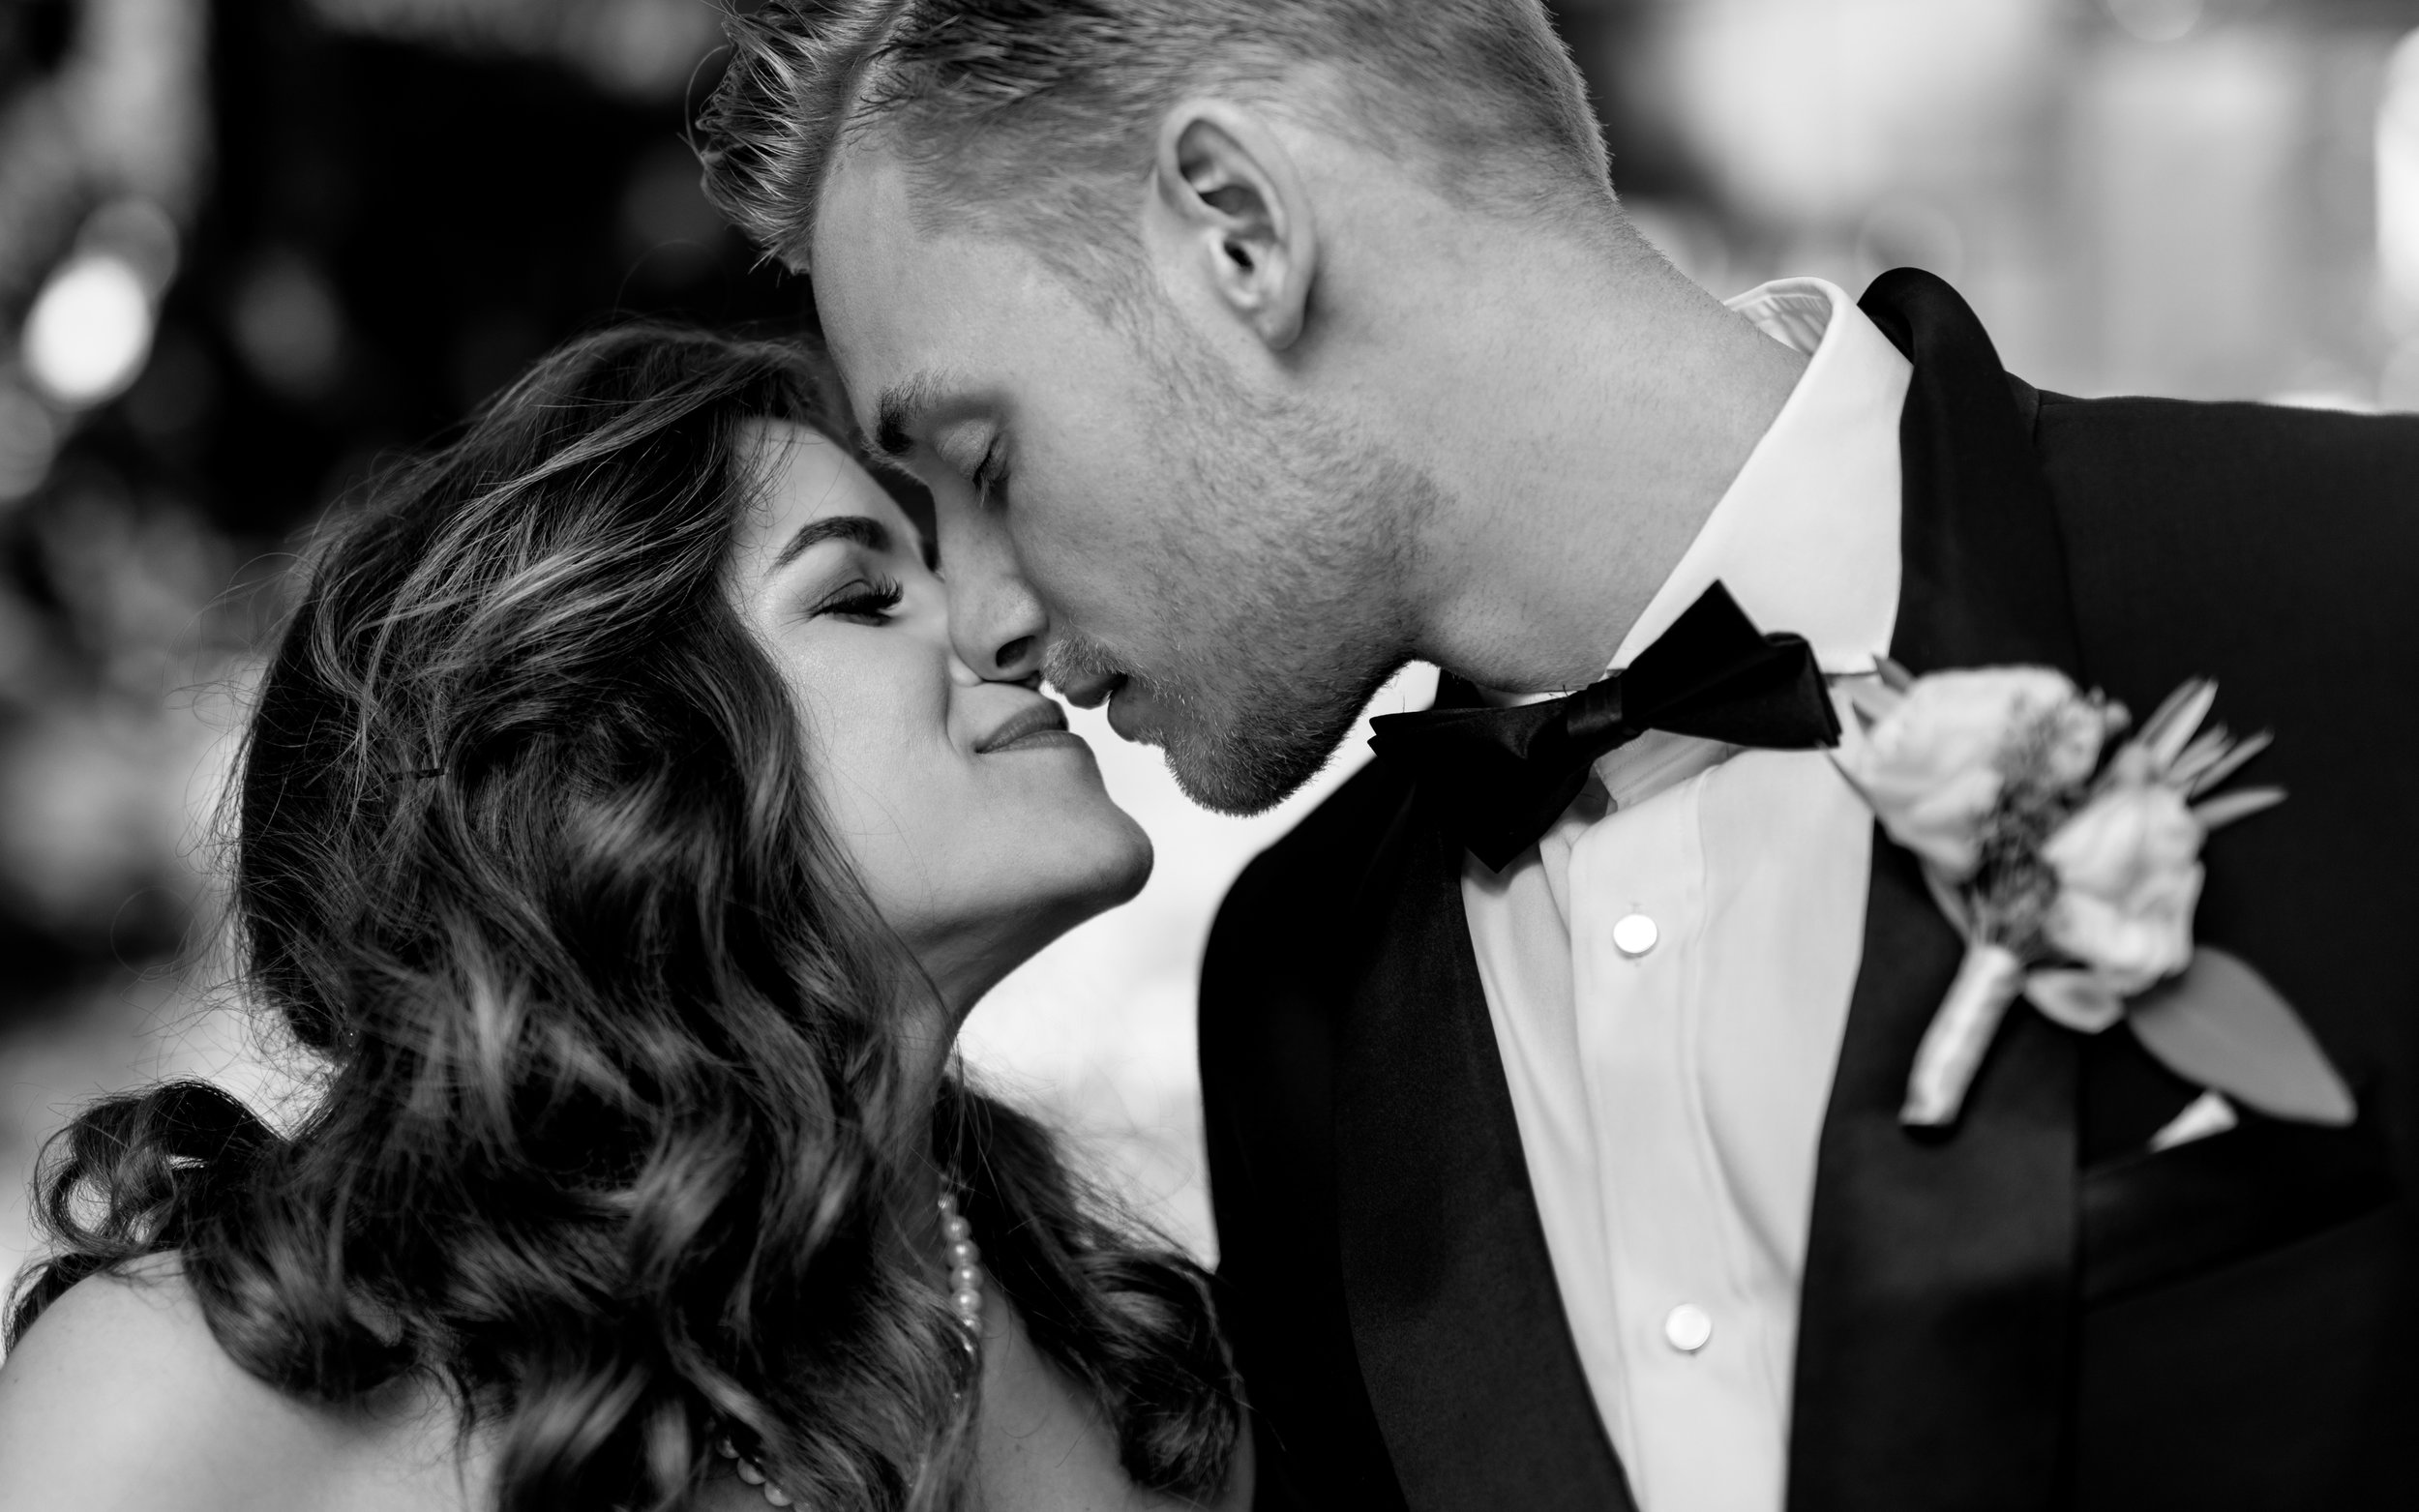 herastudios_wedding_sadaf_logan_hera_selects-35.jpg